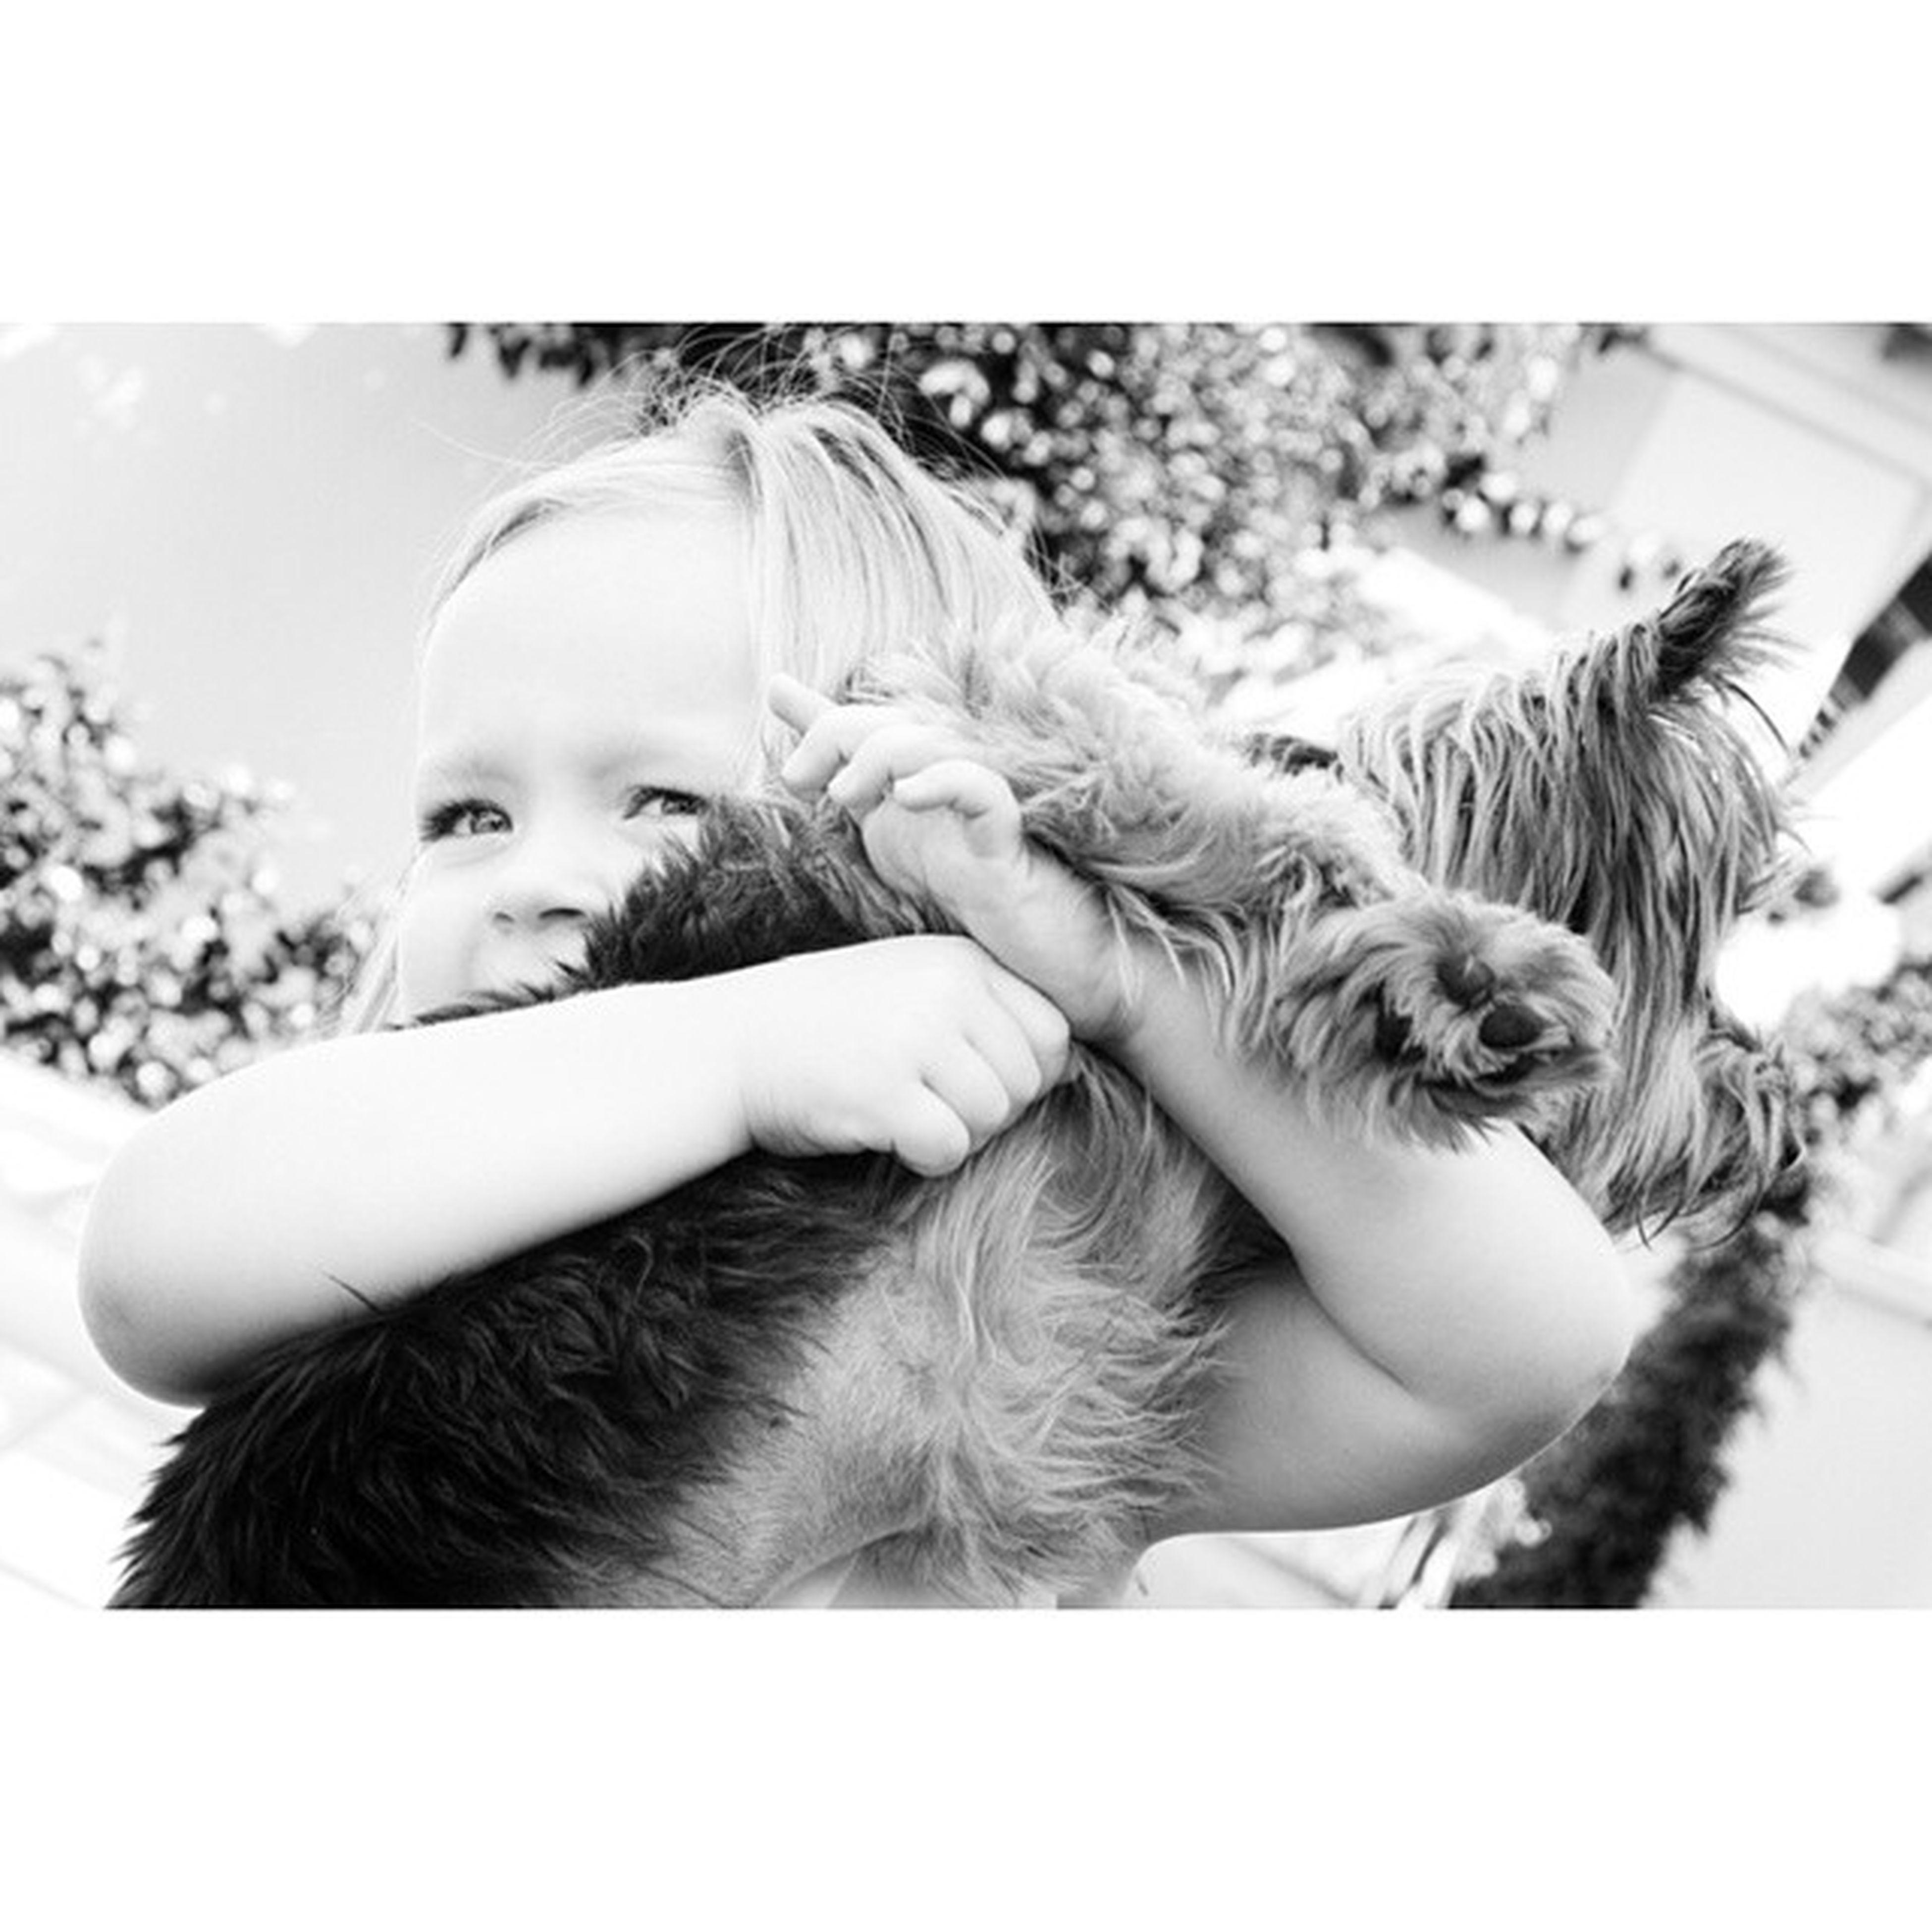 Puppy Love ... Emma EmmaTurns3 Blackandwhite Friends petsOfInstagram cuddles hugsForDays goodCompany goodTimes birthday partyTime inTheMoment realLife